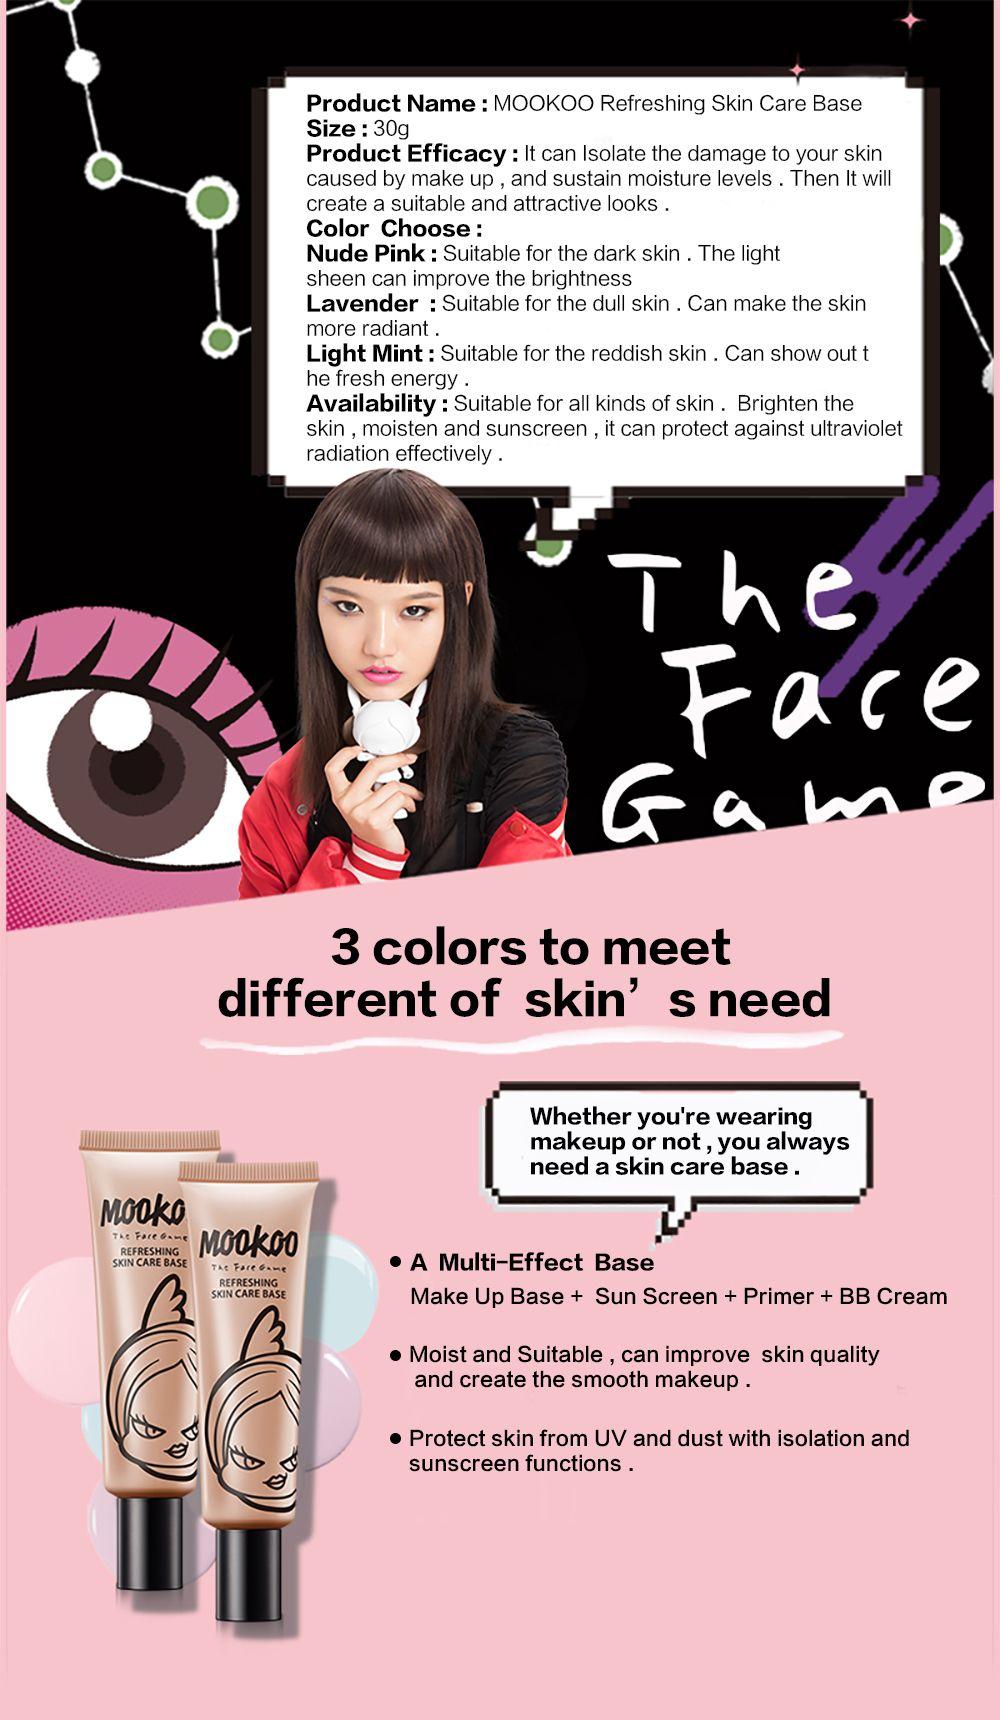 MOOKOO Refreshing Skin Care Base Make Up Base and Long Lasting Moisturize